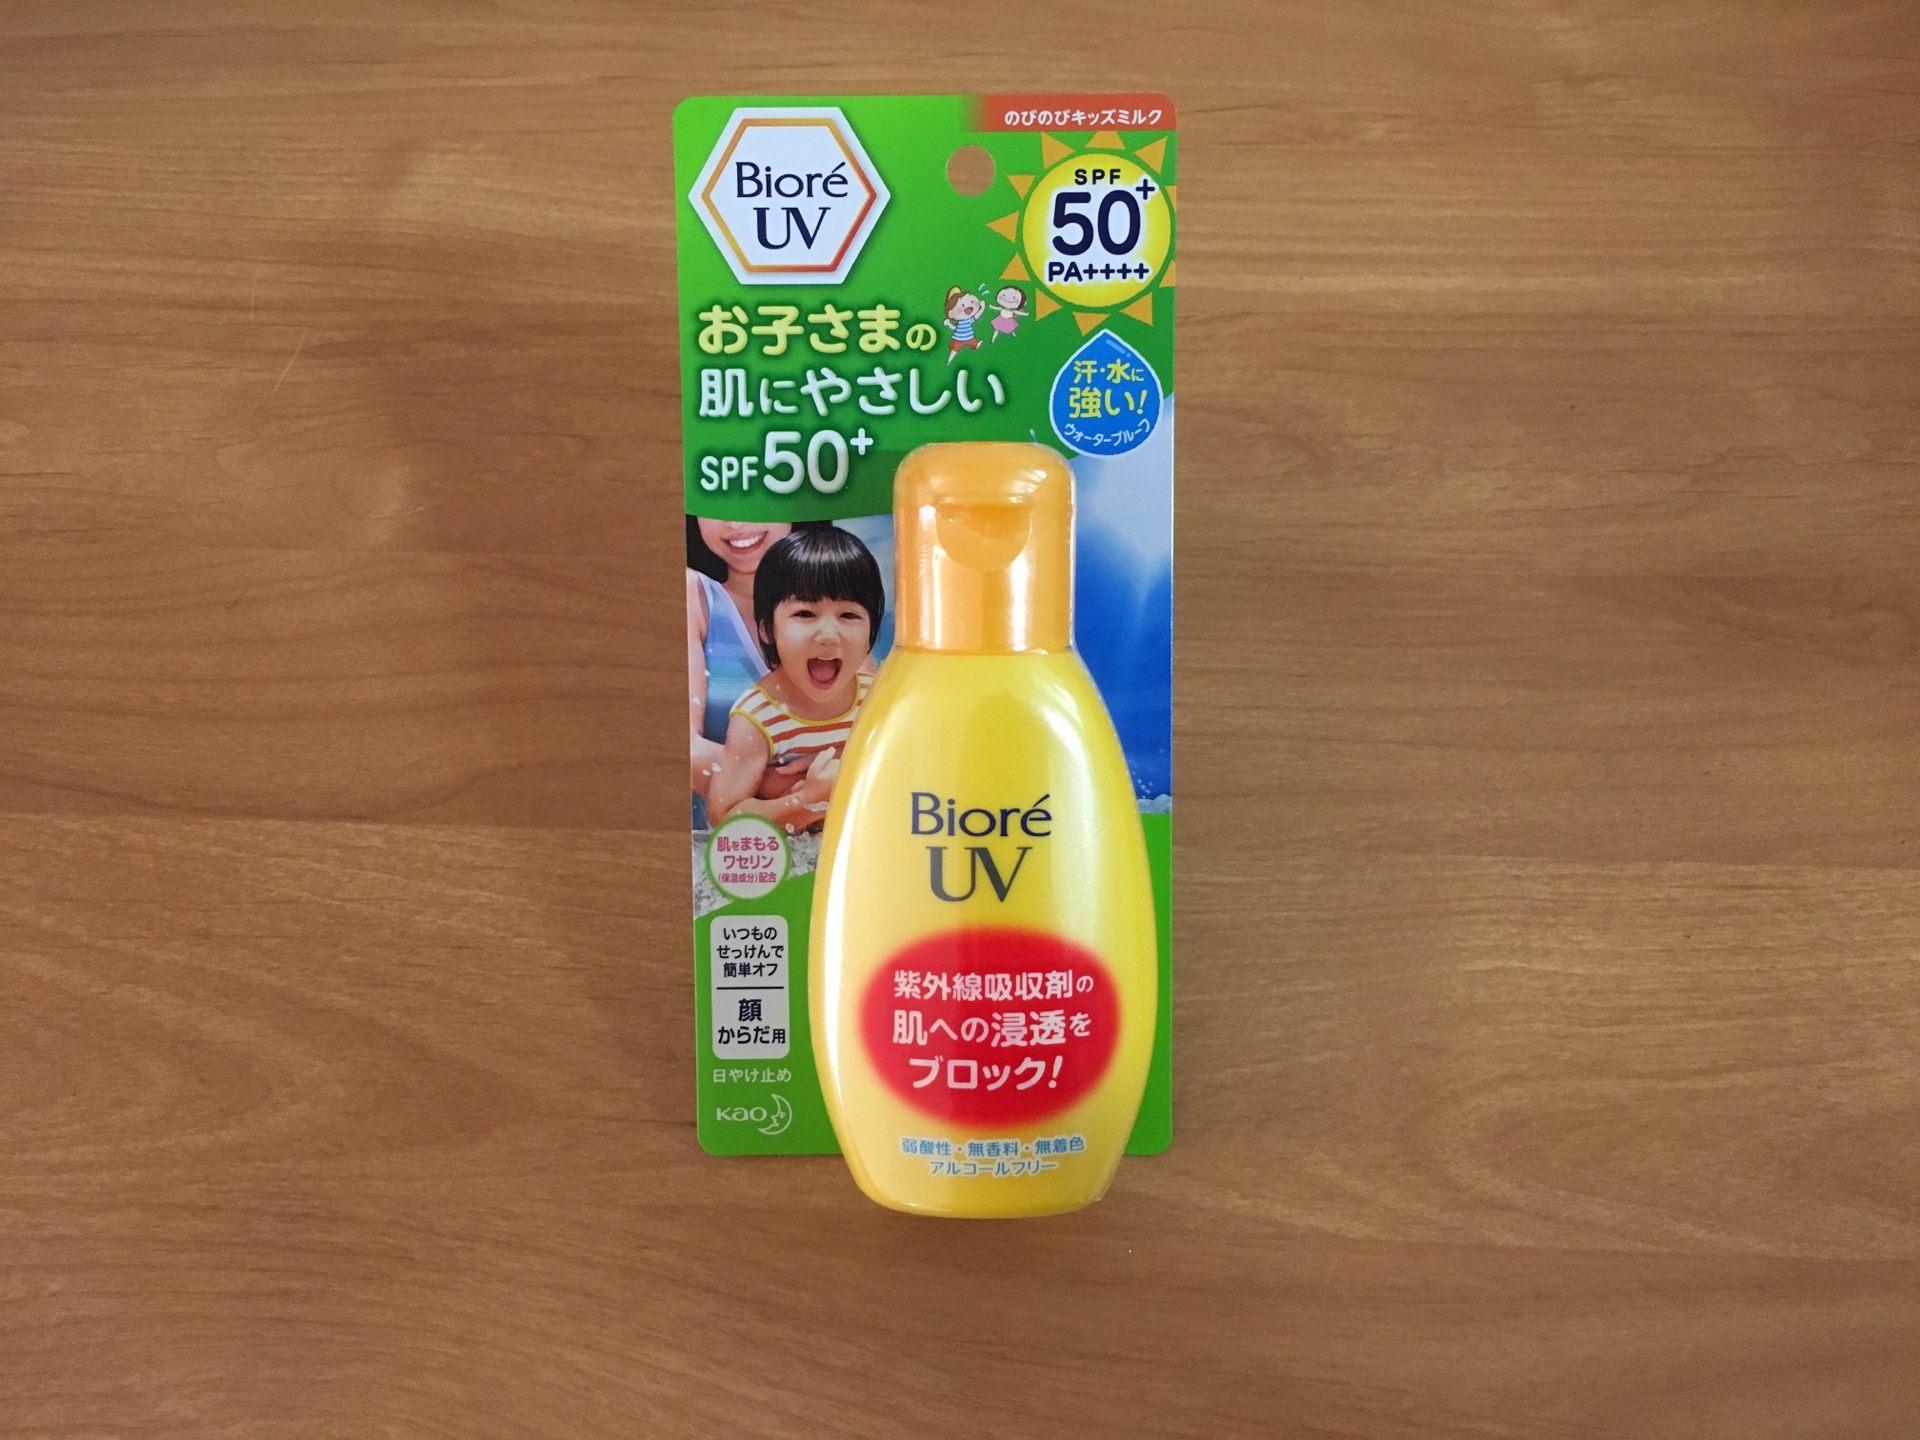 Bioré儿童温和防晒乳液 SPF50+